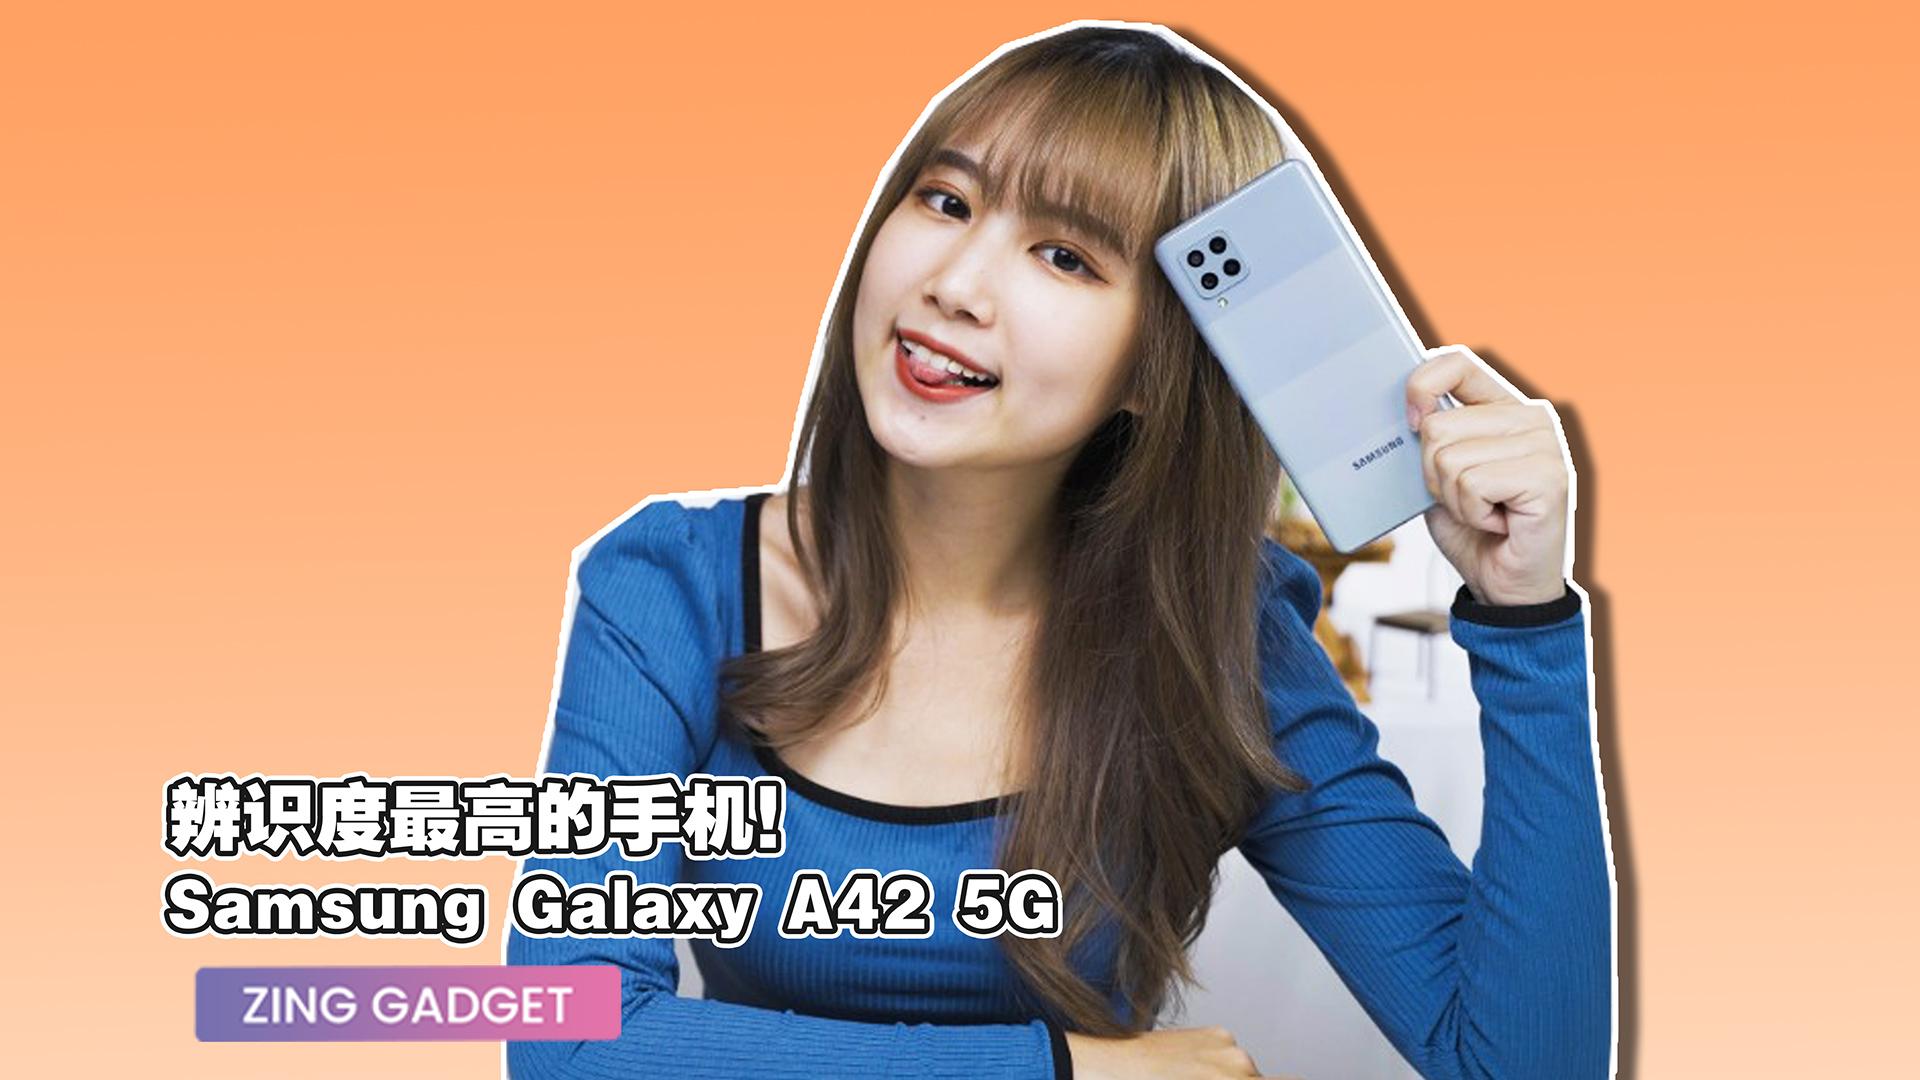 Zing Gadget|开箱三星 Galaxy A42 5G!